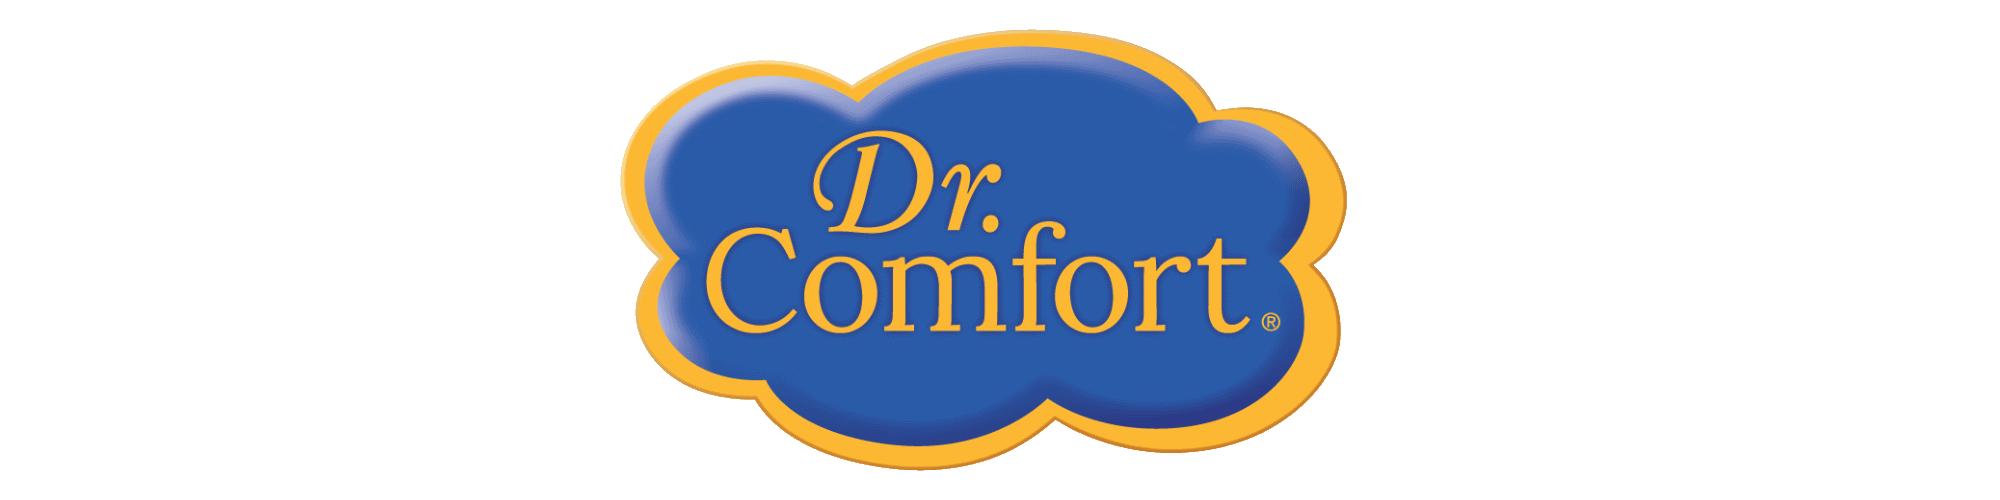 Dr comfort men s. Clipart walking comfortable shoe